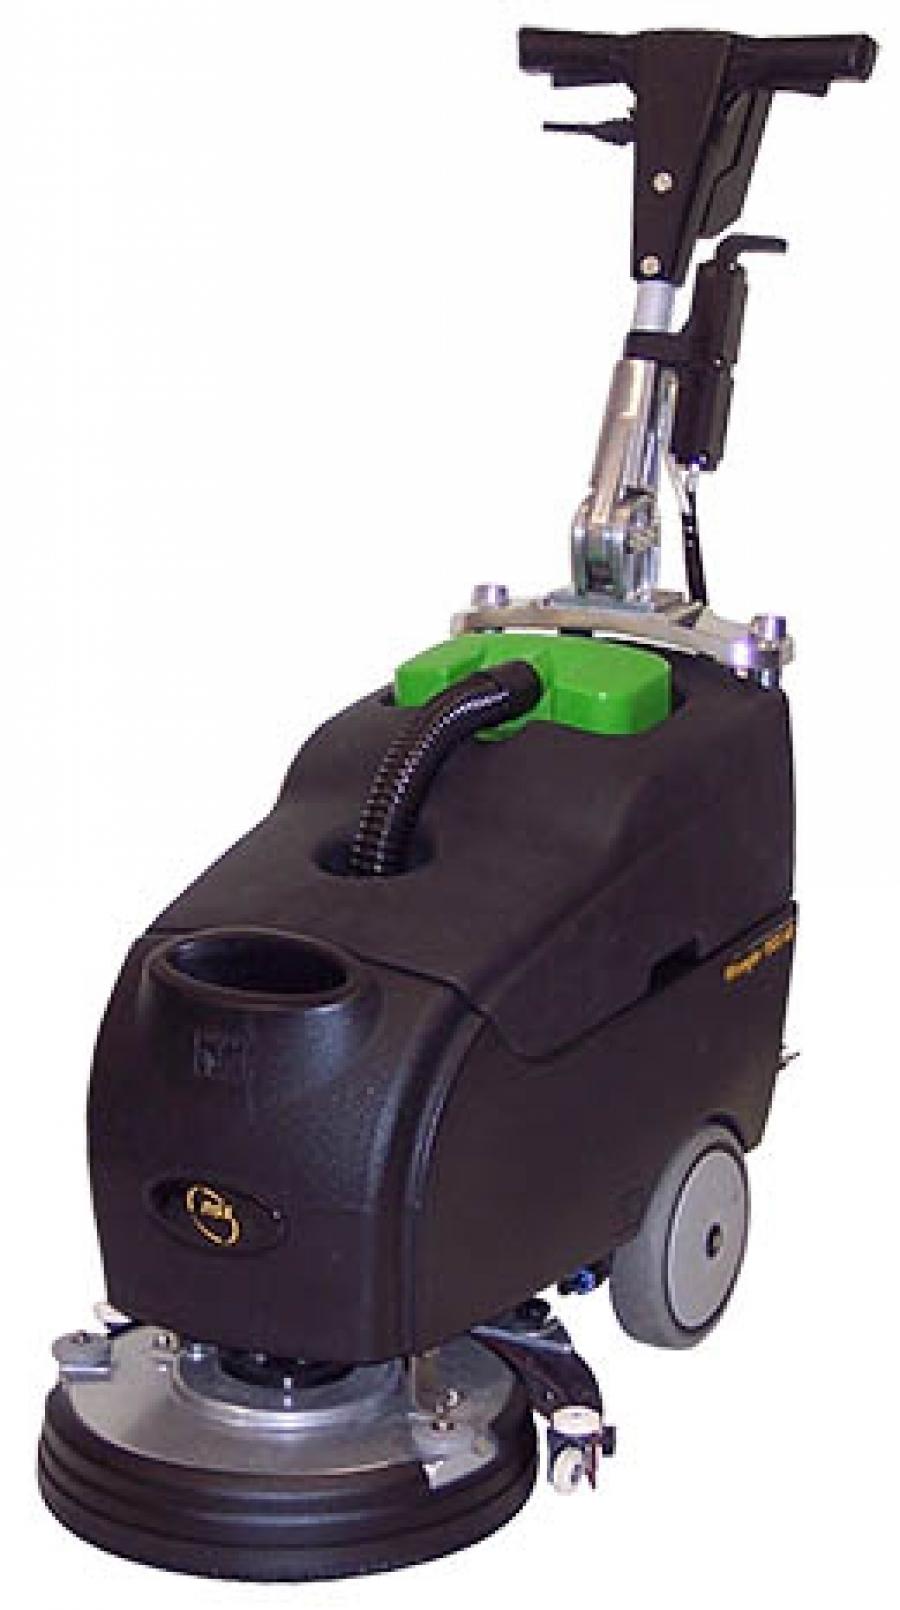 Wrangler 1503 ab / ae automatic scrubbers